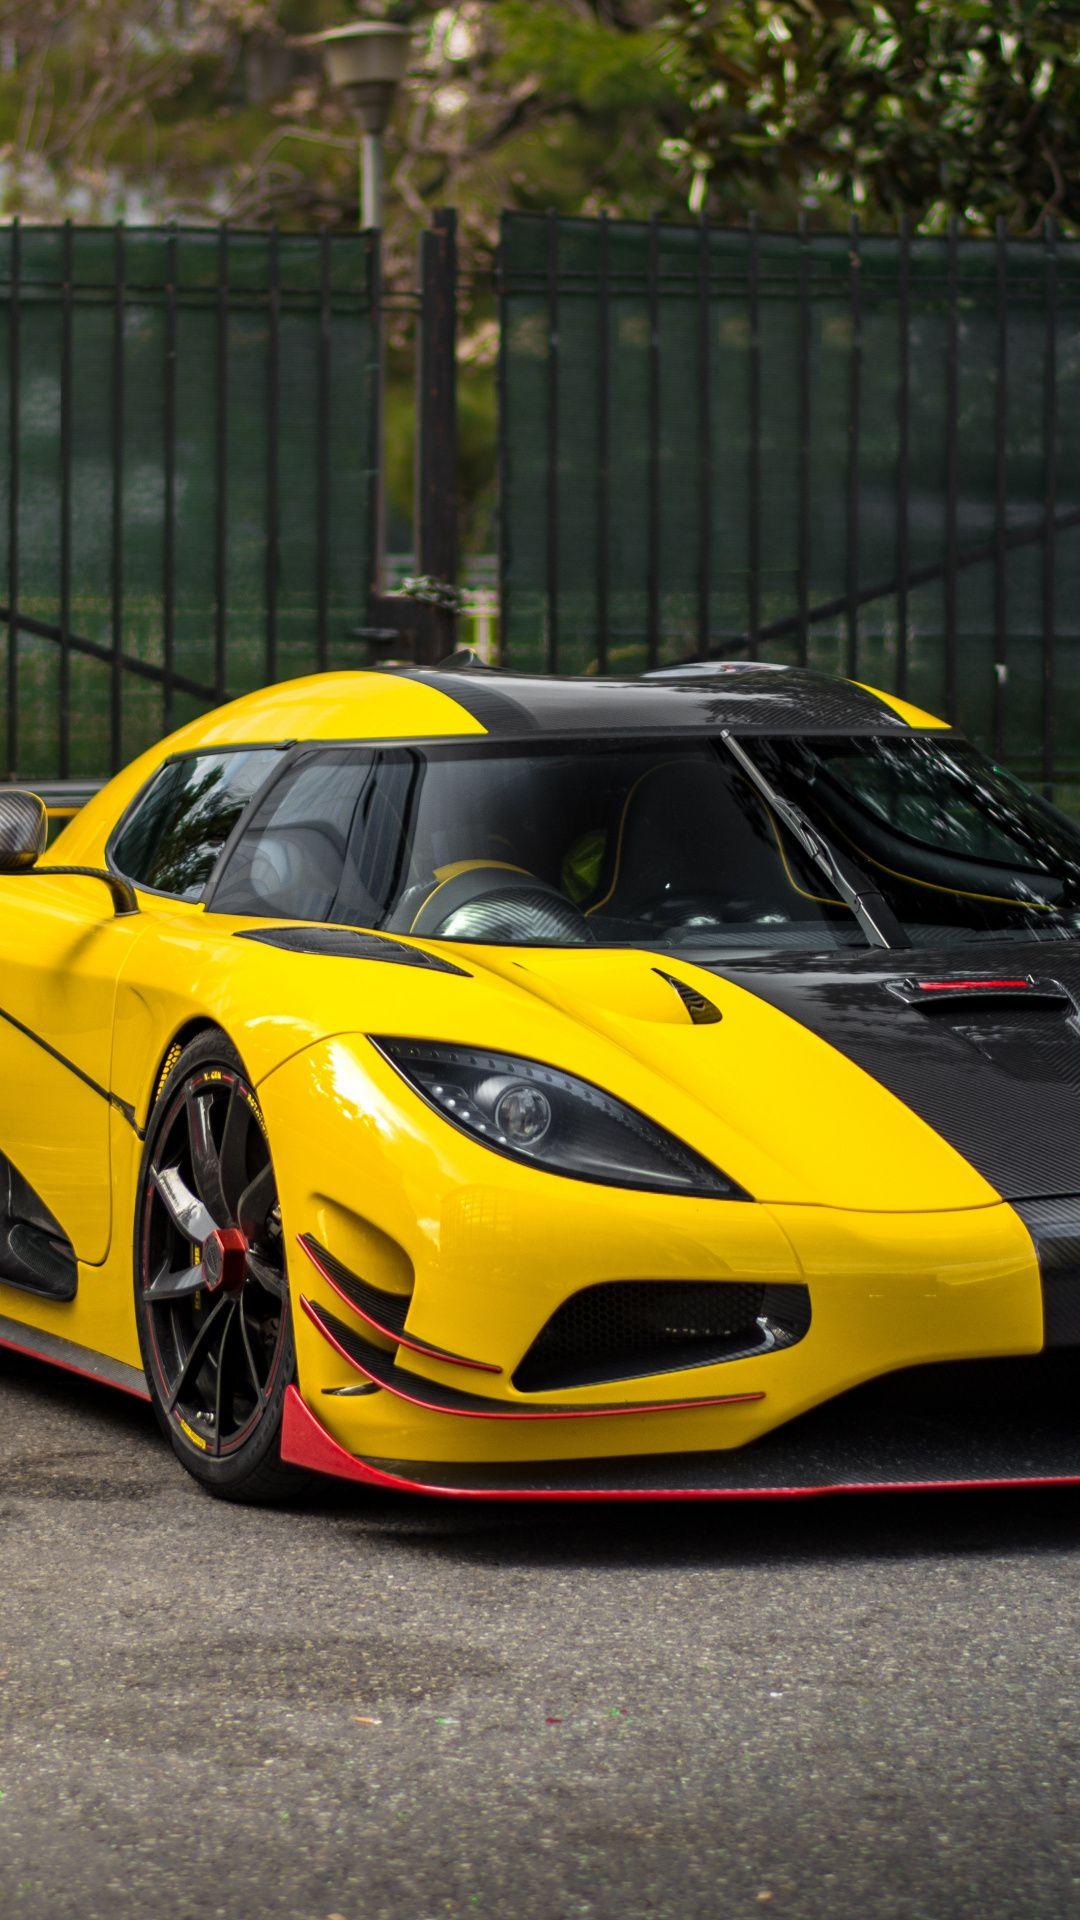 Sports Car Yellow Koenigsegg Agera Wallpaper Cars Pinterest